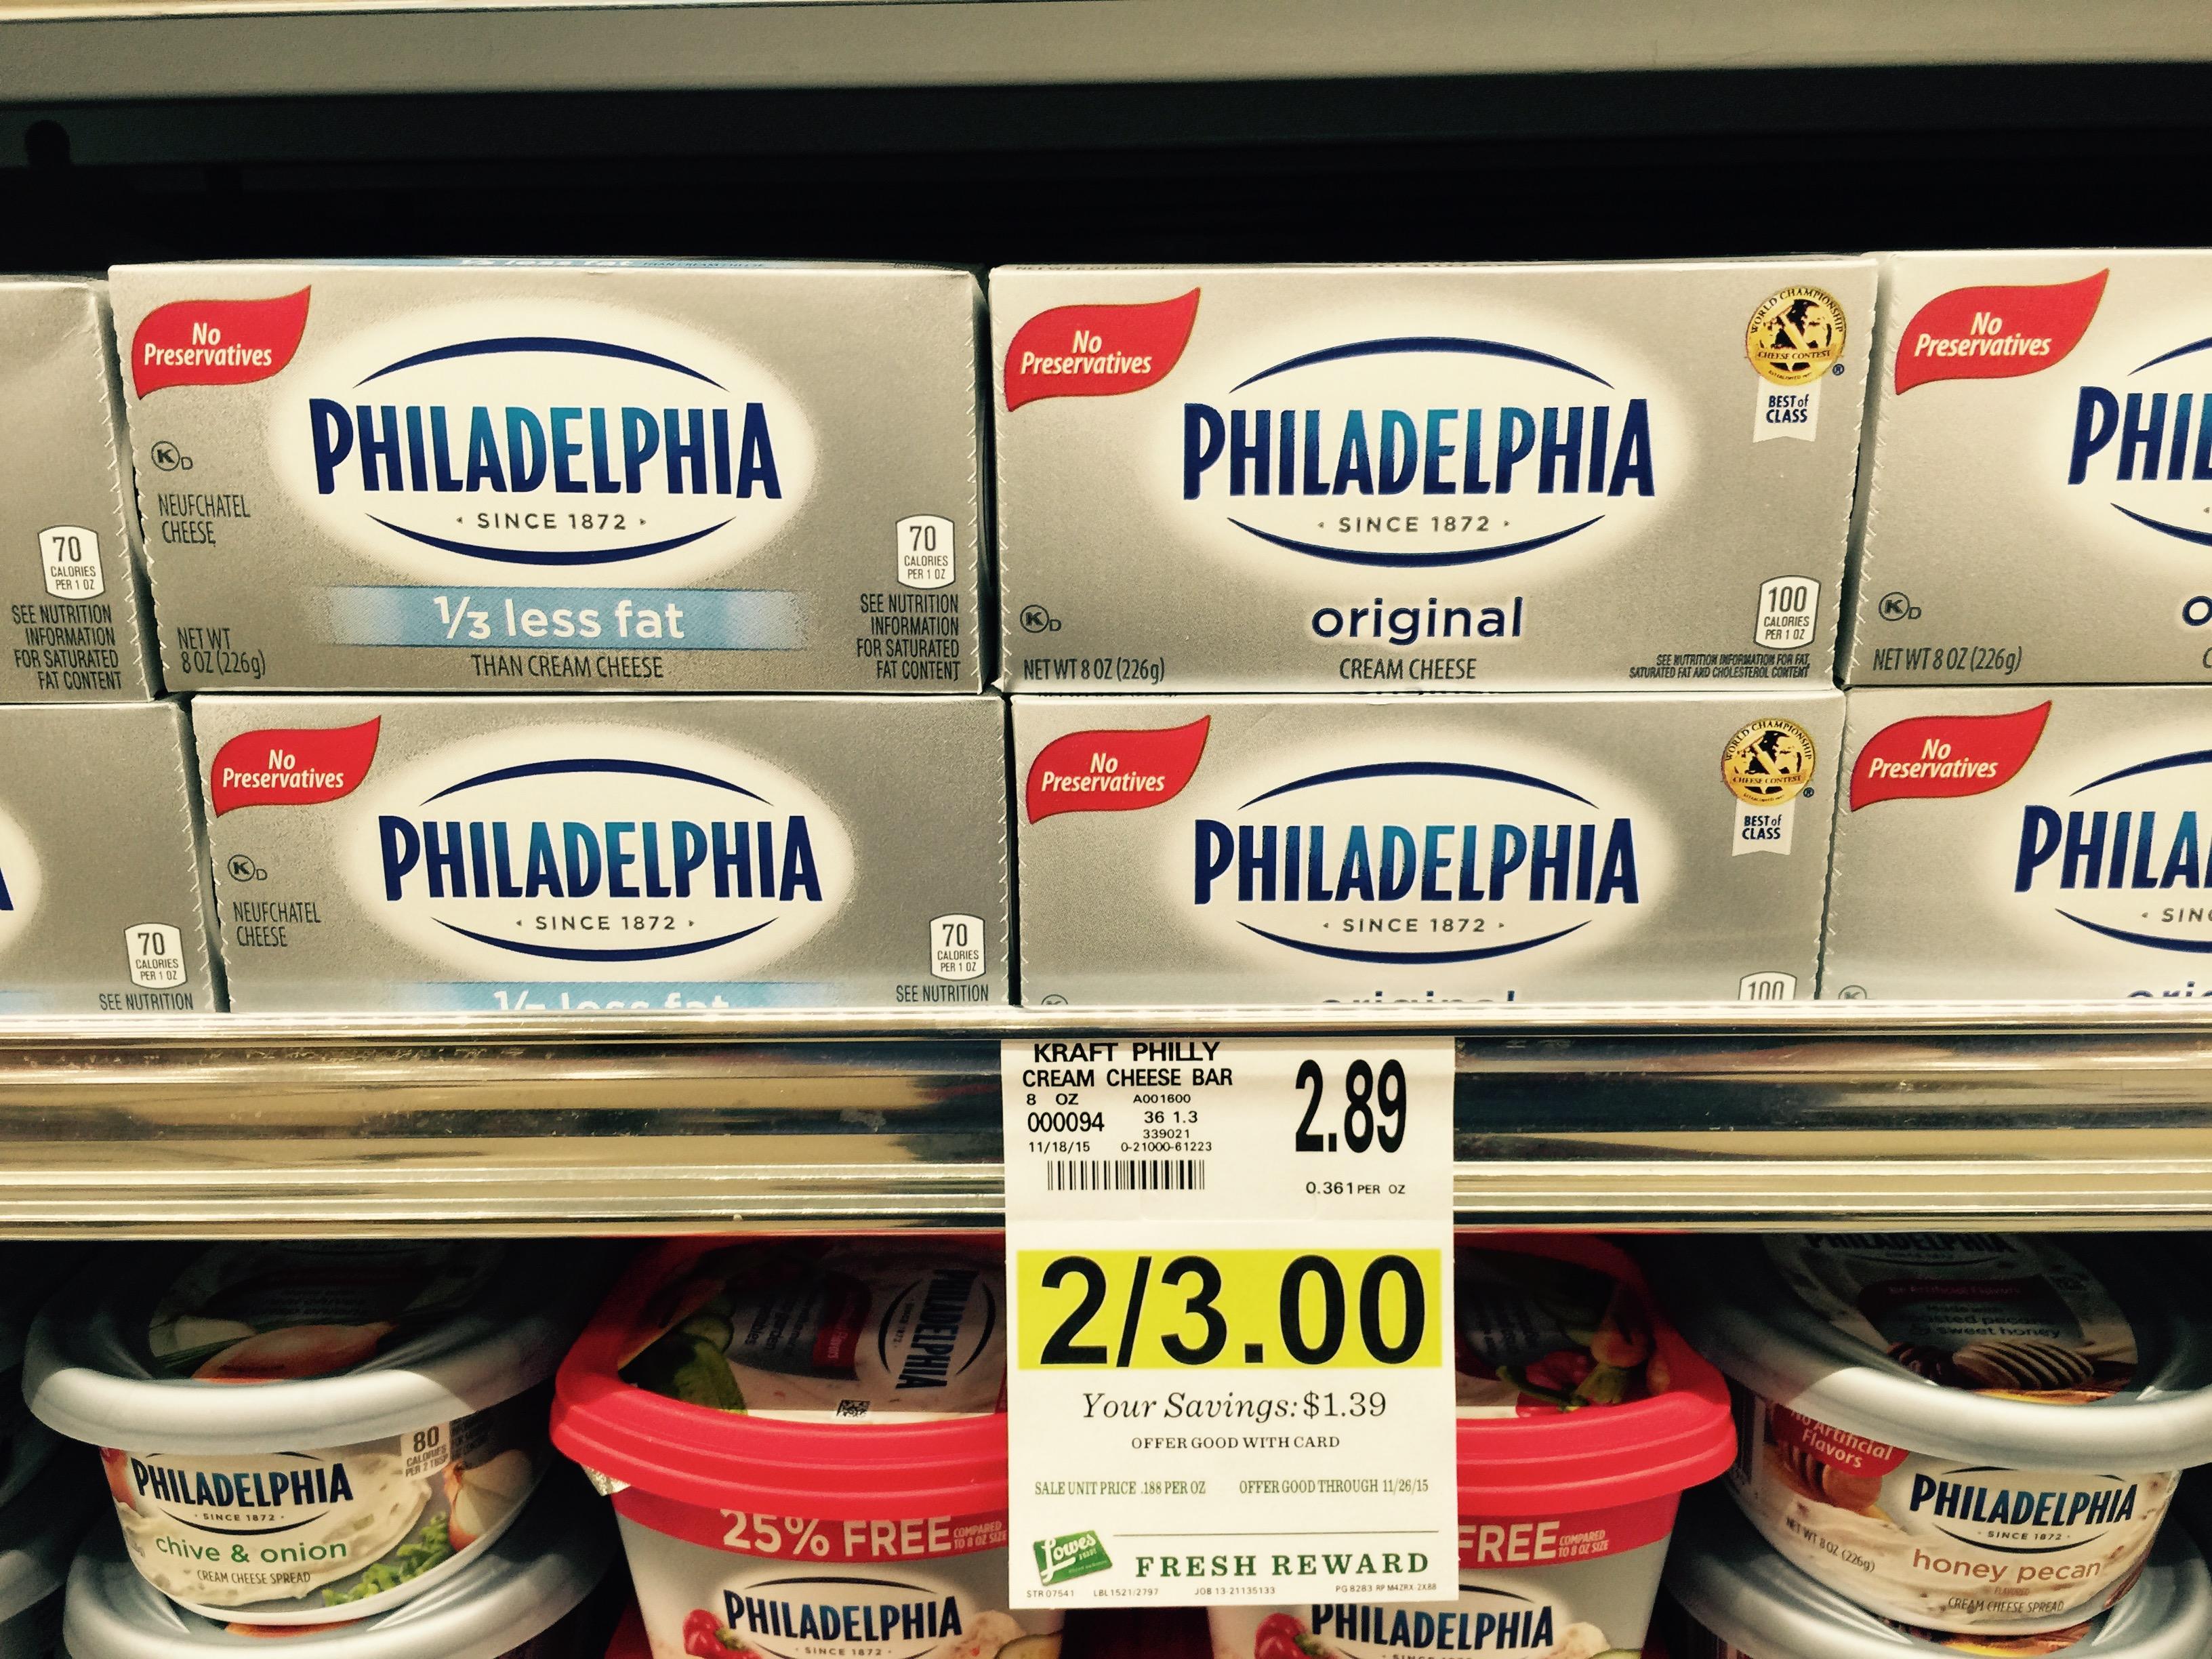 Philadelphia deals coupons